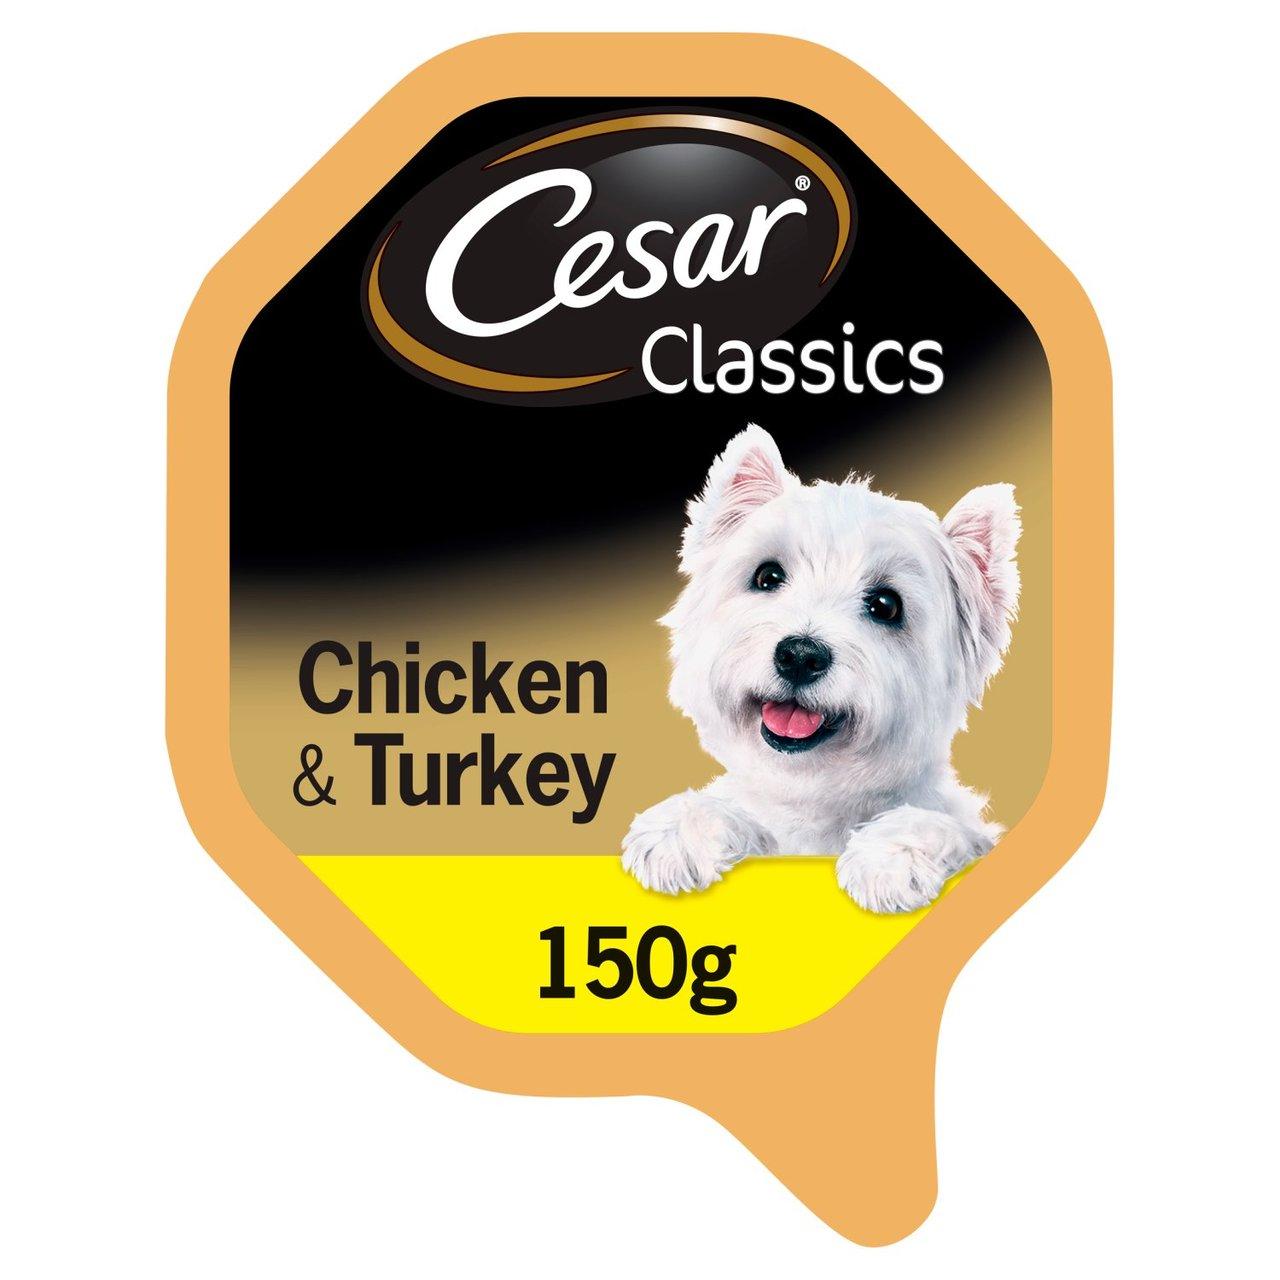 An image of Cesar Classics Tray Chicken & Turkey